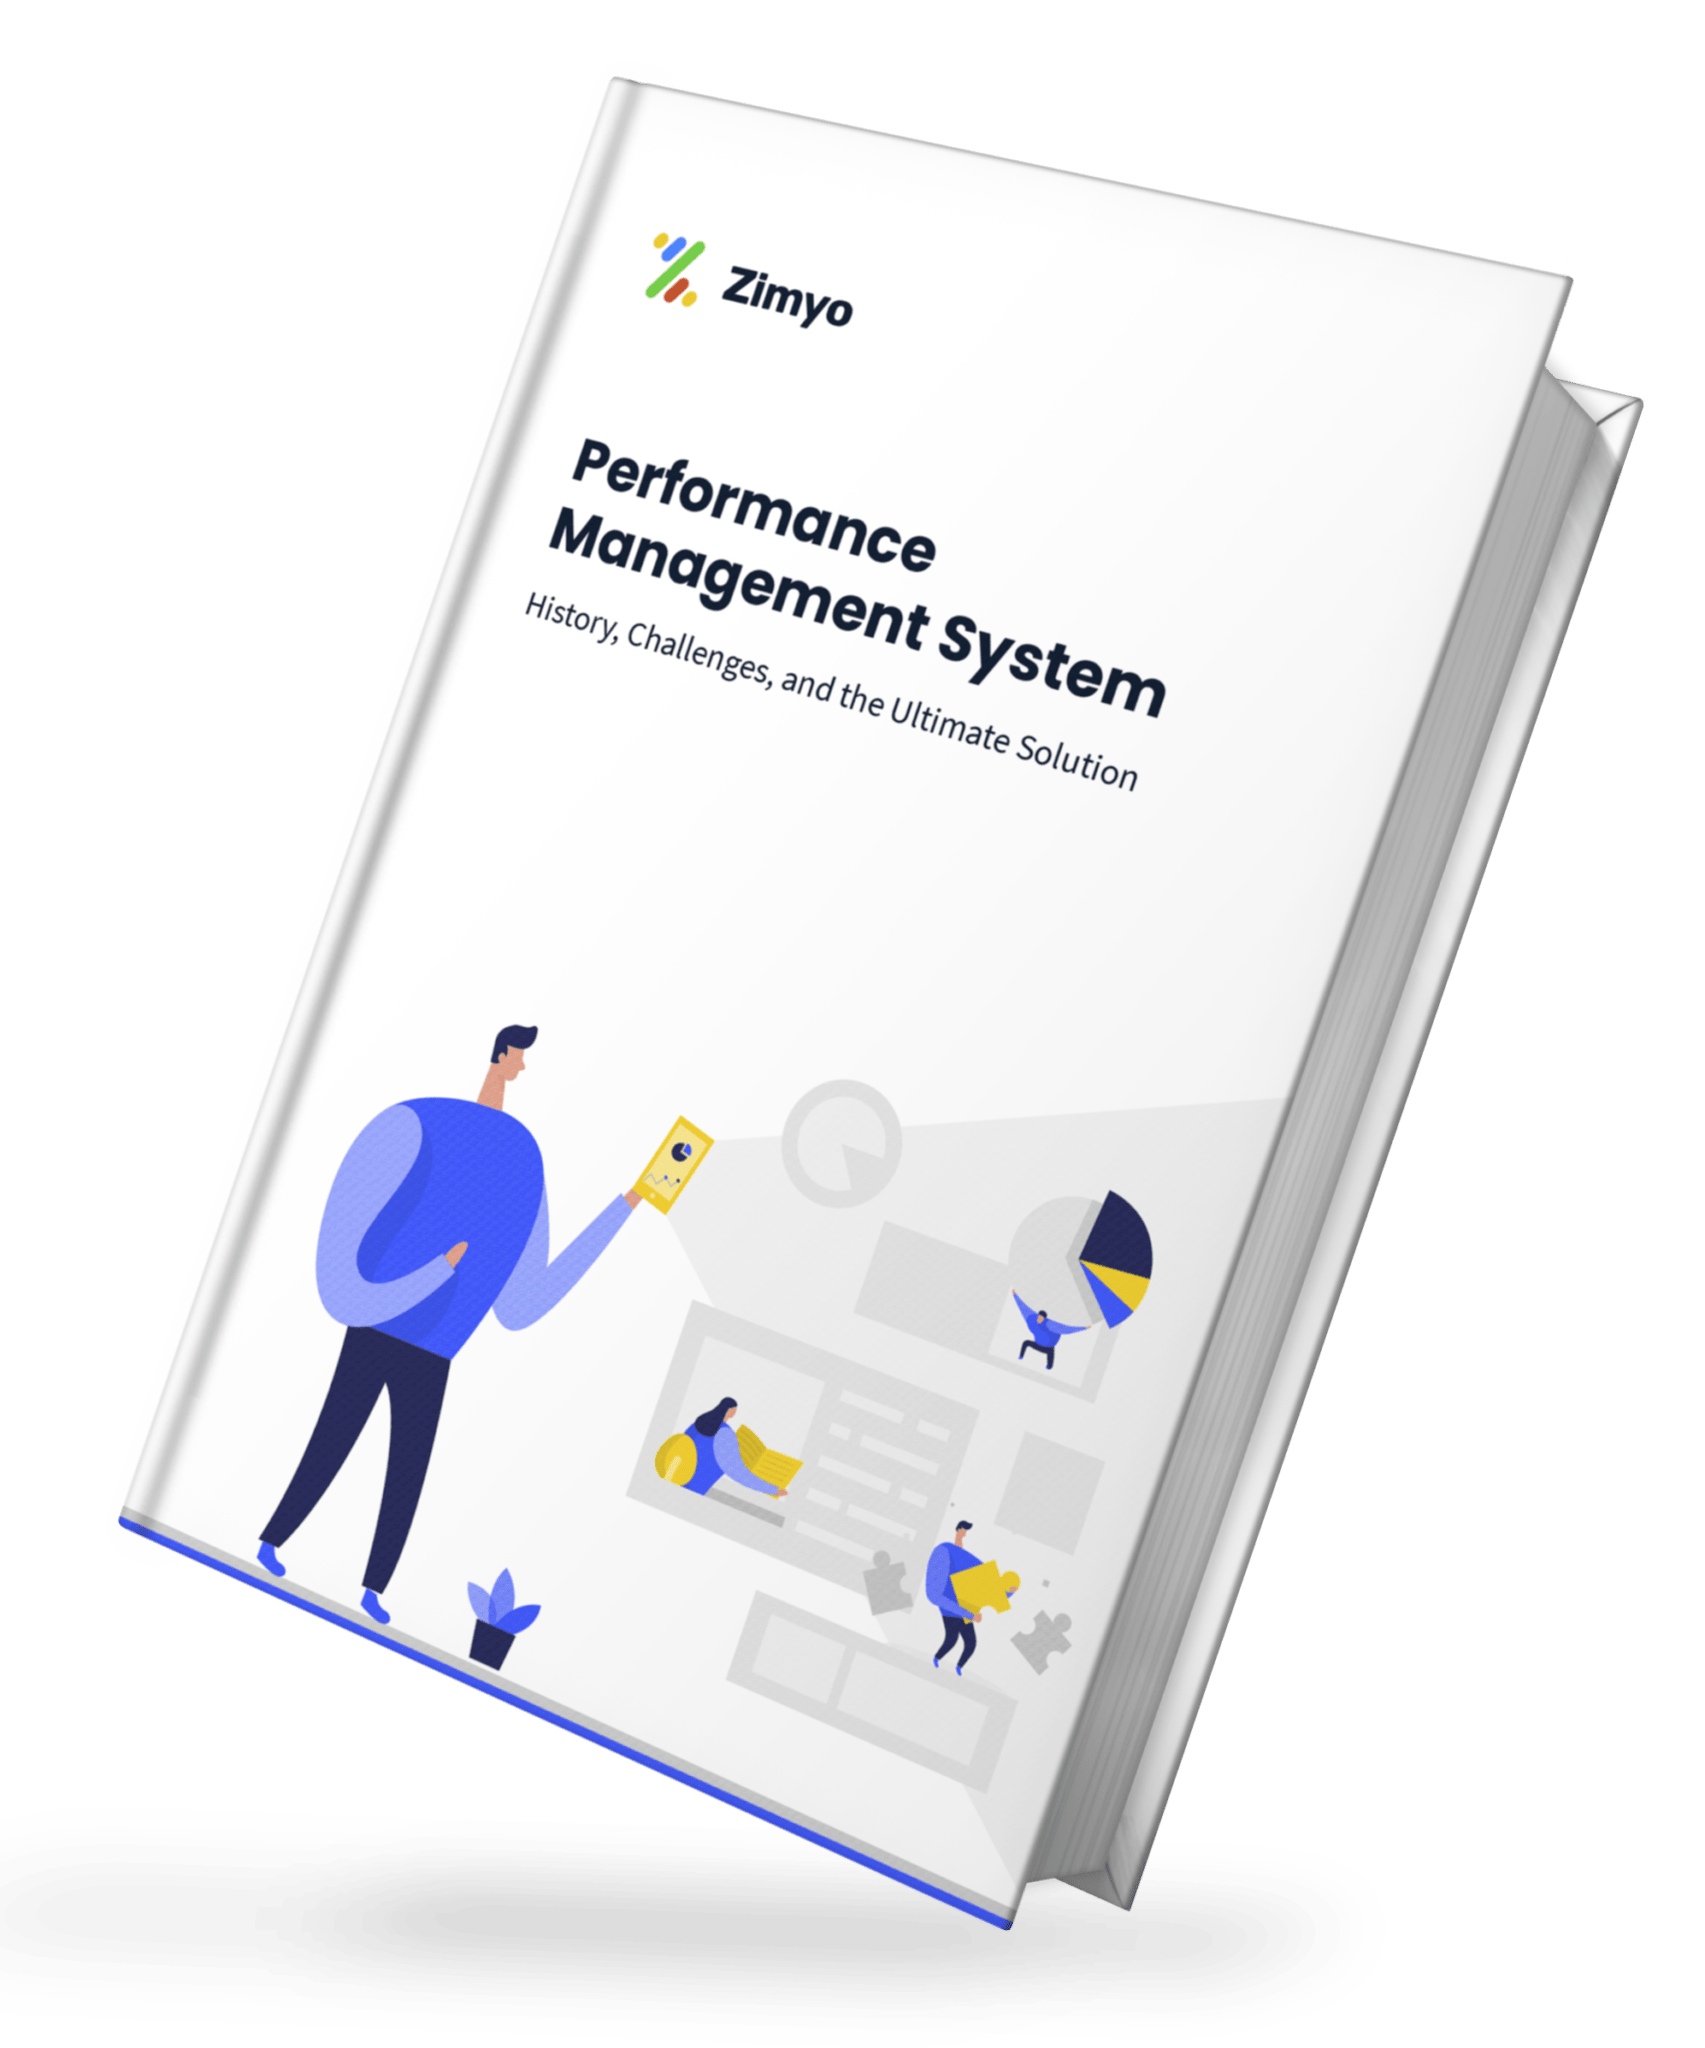 ebook performance management system zimyo